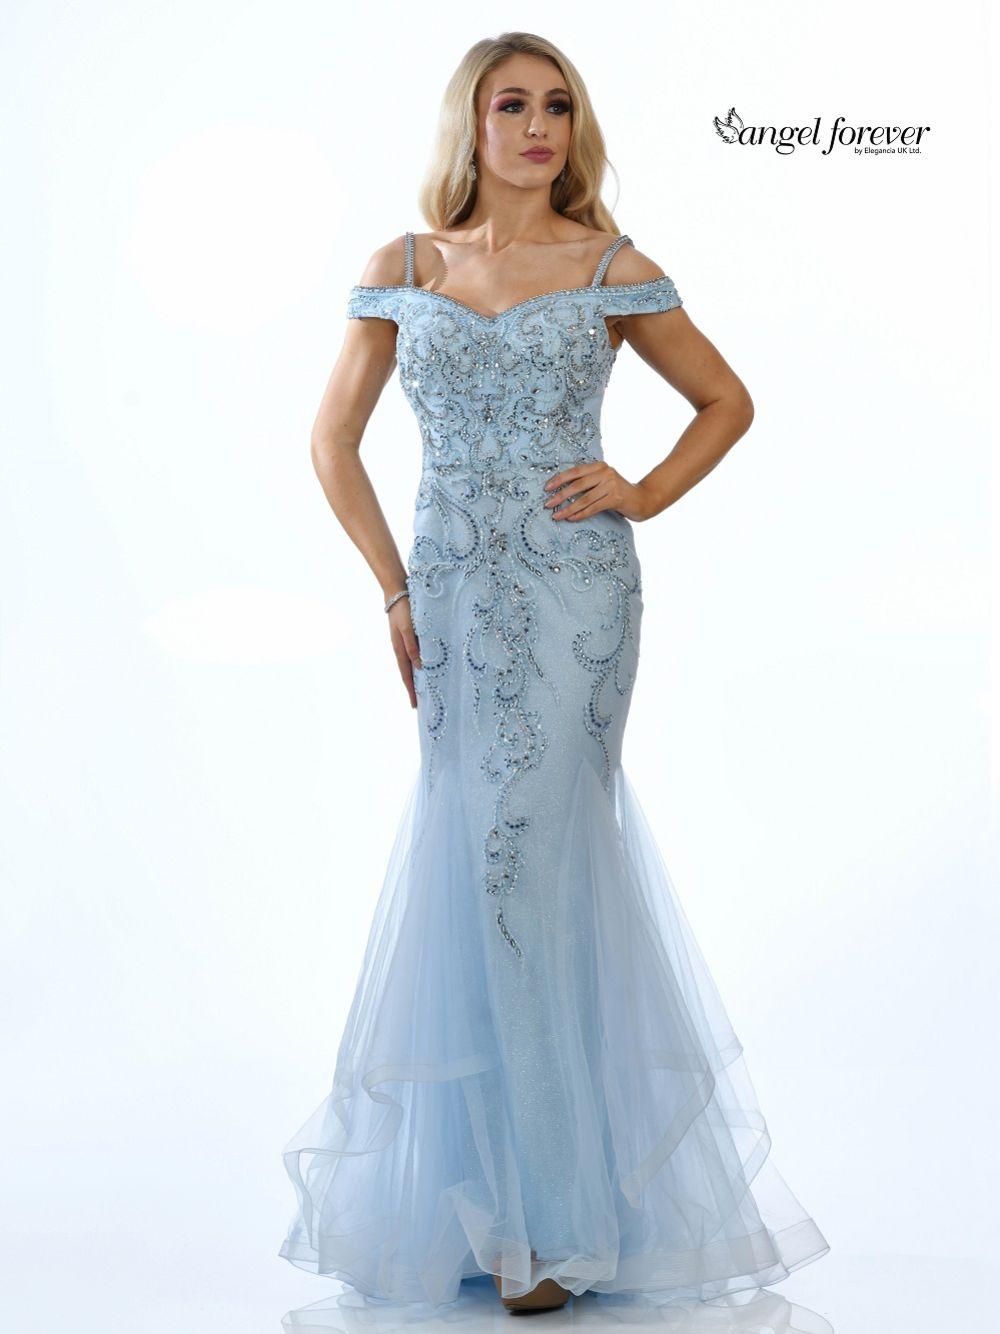 Angel Forever Embellished Shimmer Tulle Mermaid Prom Dress (Ice Blue)